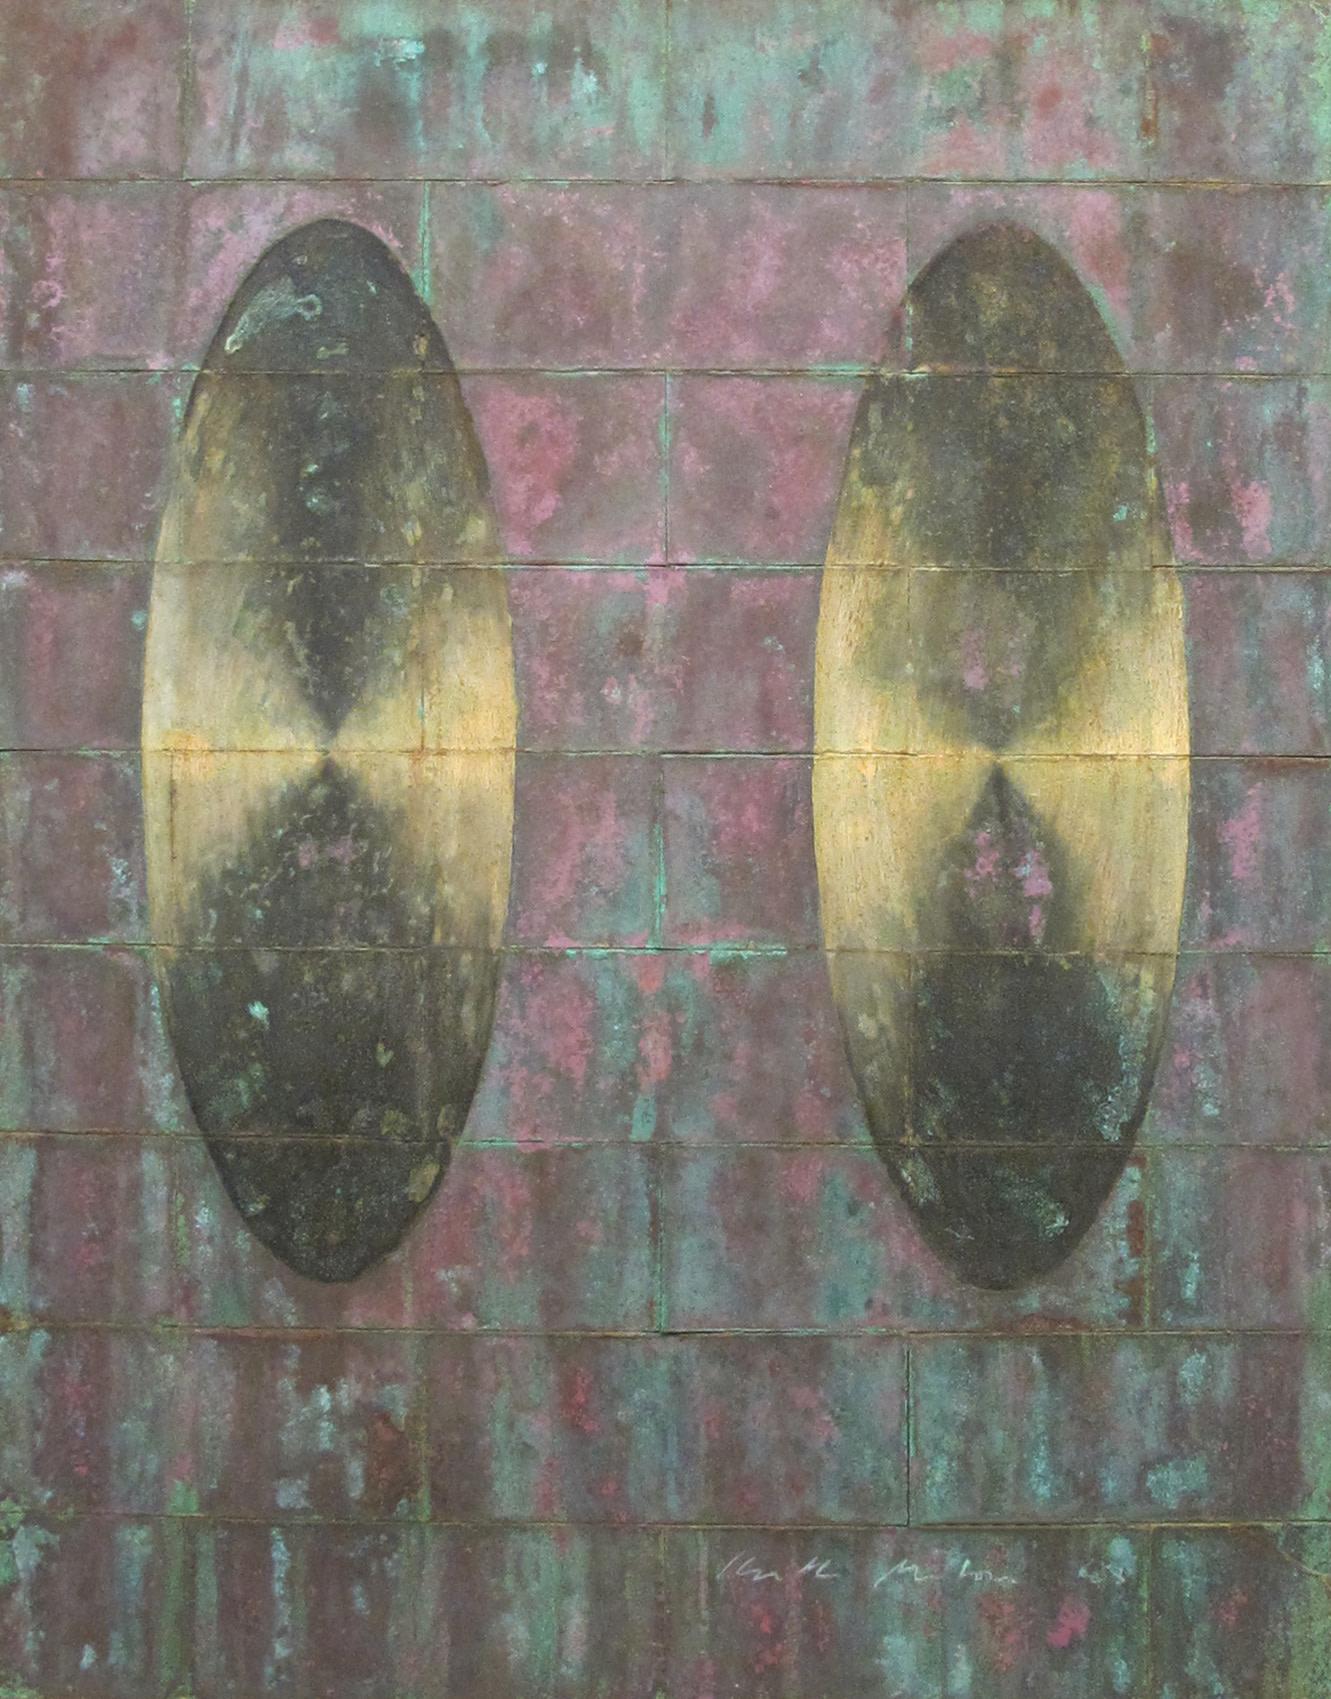 <span class=&#34;link fancybox-details-link&#34;><a href=&#34;/artists/59-keith-milow/works/803/&#34;>View Detail Page</a></span><div class=&#34;artist&#34;><strong>Keith Milow</strong></div> Born 1945 <div class=&#34;title&#34;><em>Drawing No. 88/26/D</em></div> <div class=&#34;signed_and_dated&#34;>signed and dated '88</div> <div class=&#34;medium&#34;>oil on copper</div> <div class=&#34;dimensions&#34;>45.5 x 35.5 cms (18 x 14 ins)</div>